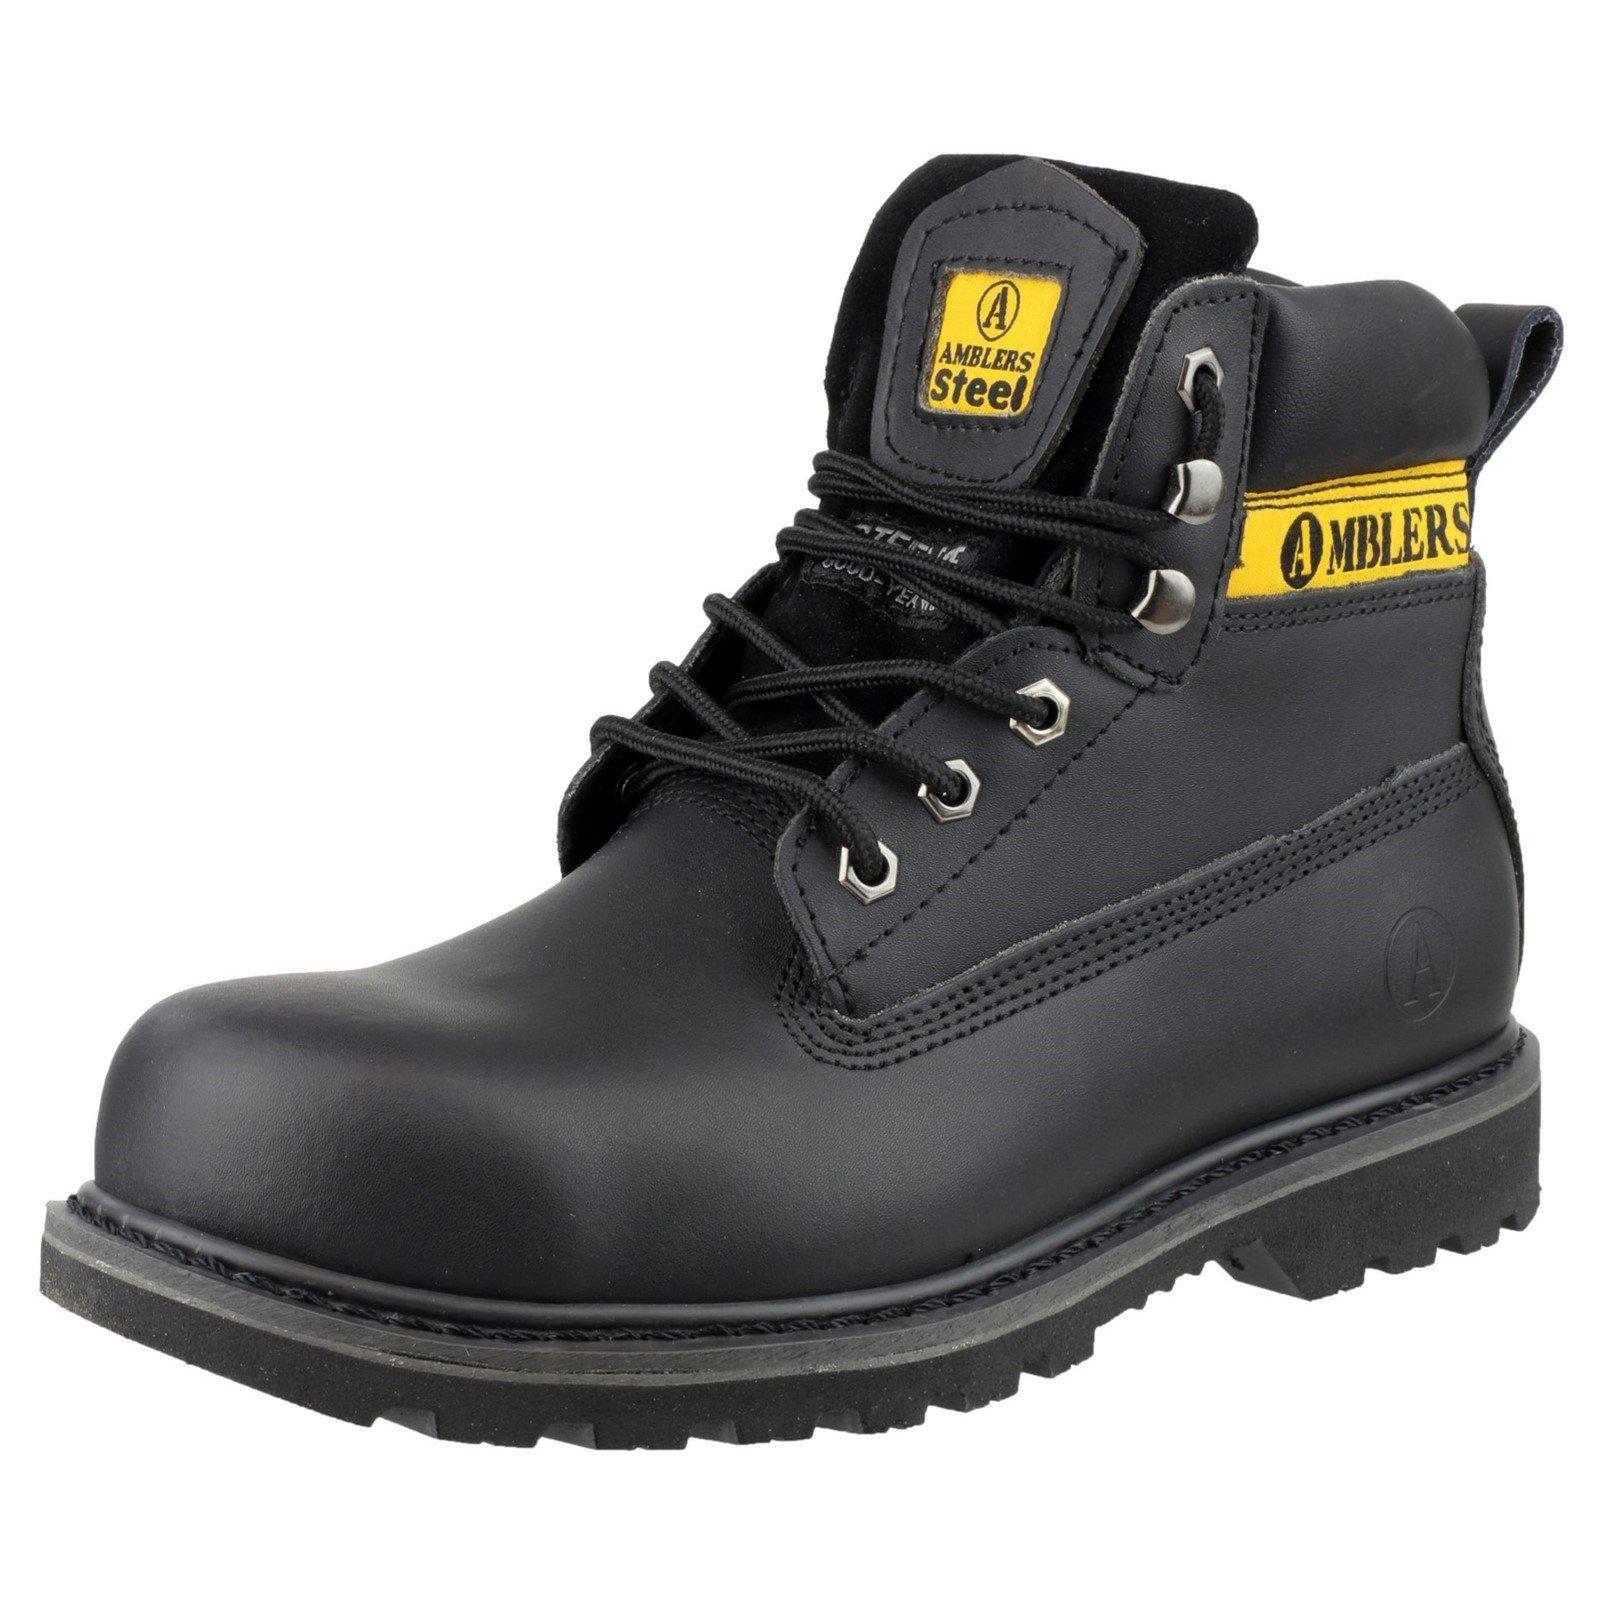 Amblers FS9 Stahlkappen-Schuhe Herren Stahlkappen-Schuhe FS9 / Sicherheitsschuhe (FS235) f3de17